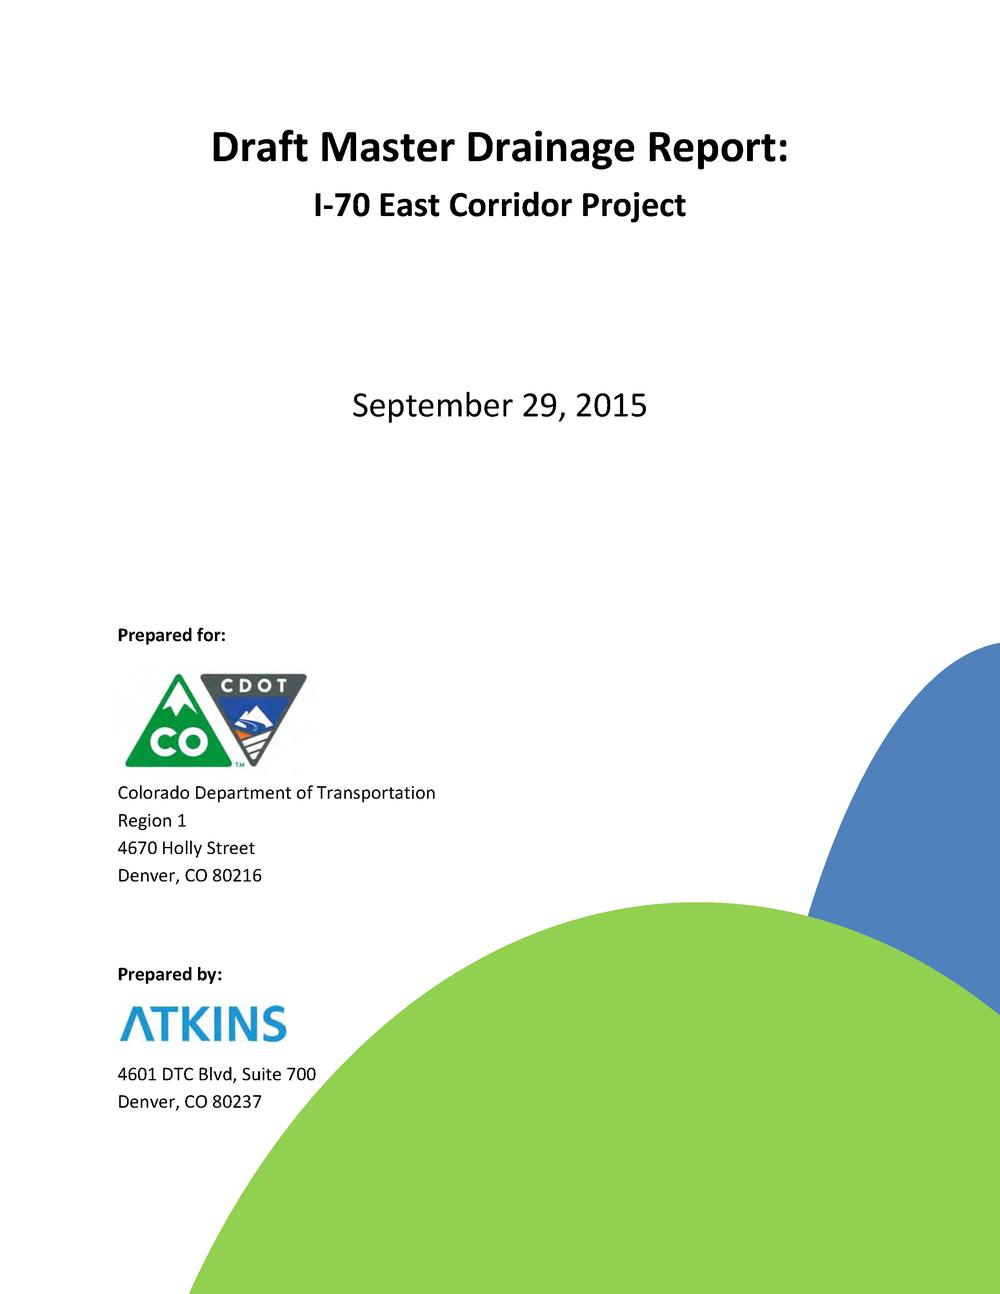 Master Drainage Report, Draft